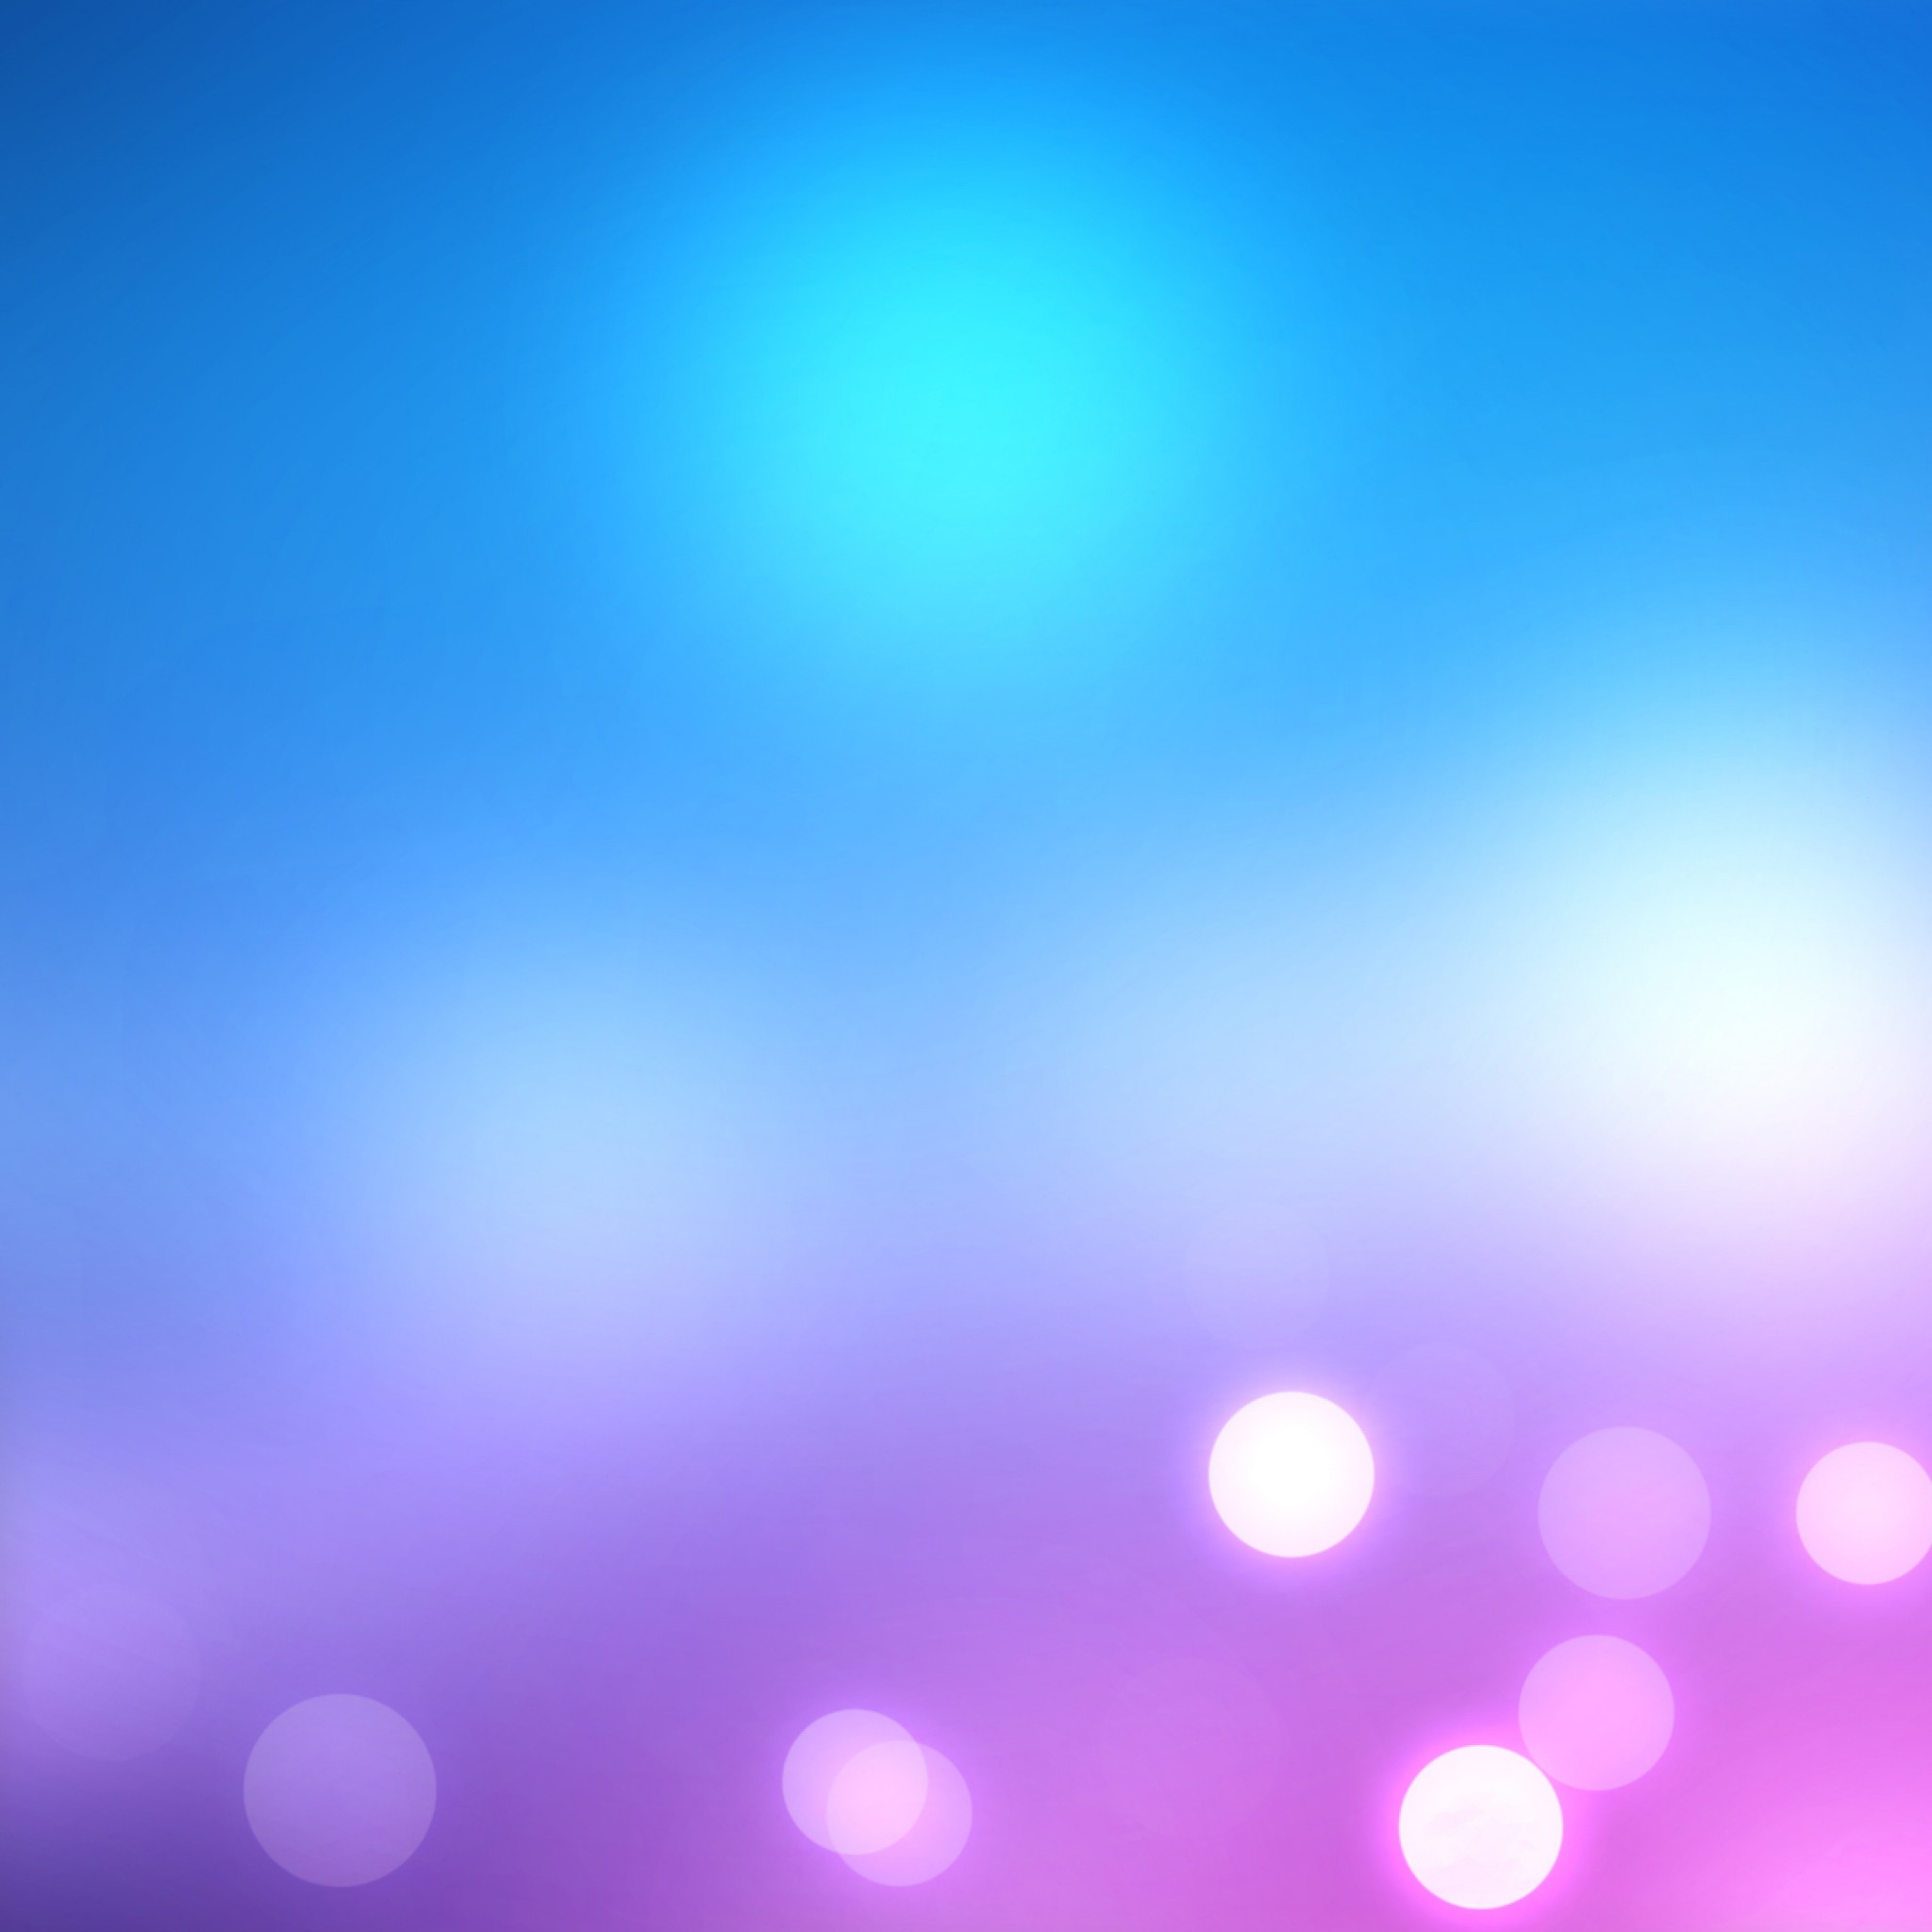 Bubble Purple 3Wallpapers iPad Retina